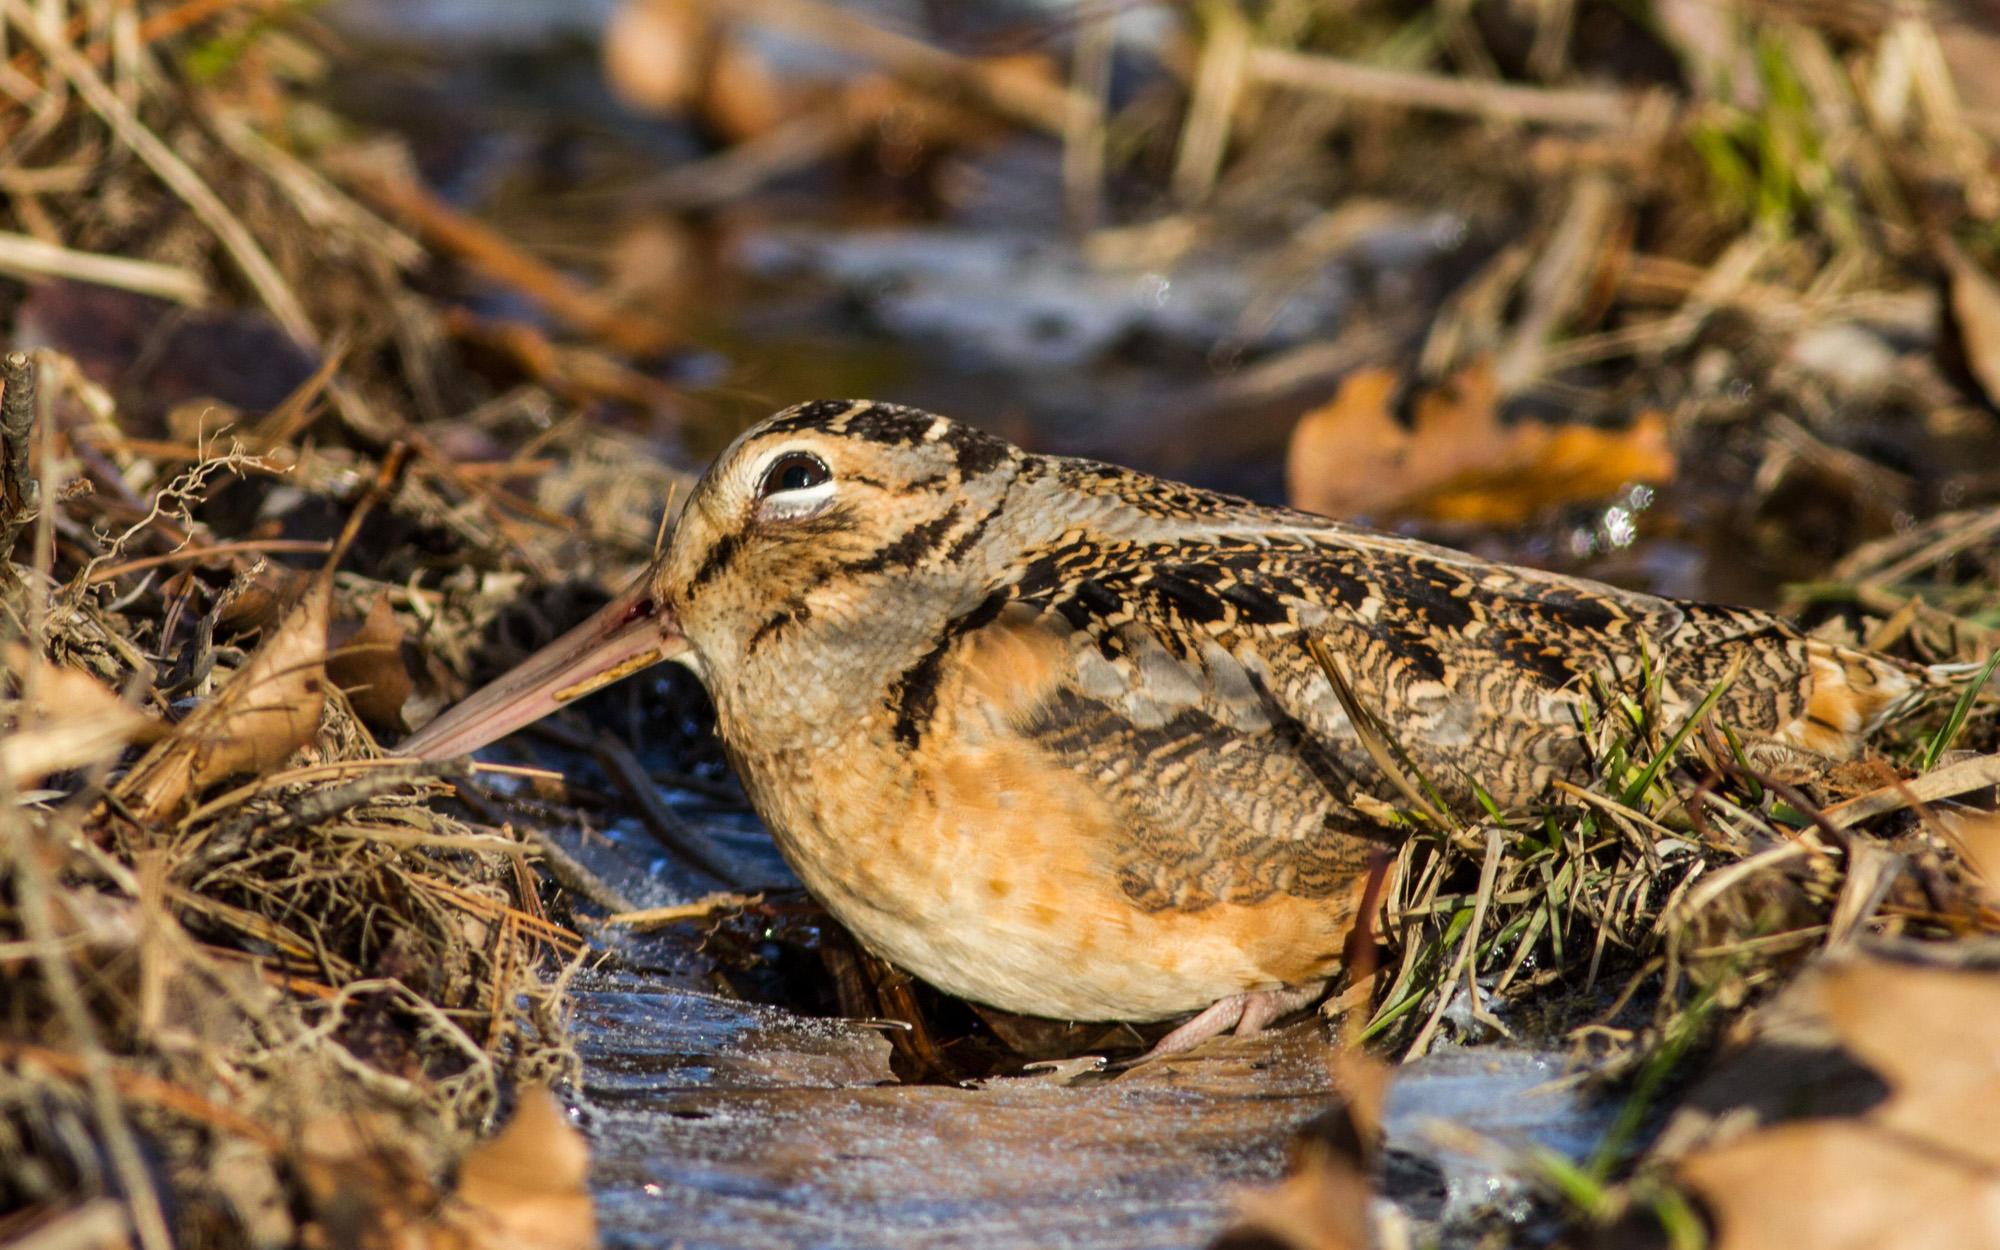 NEK nonprofit to restore bird habitats with grant money - VTDigger